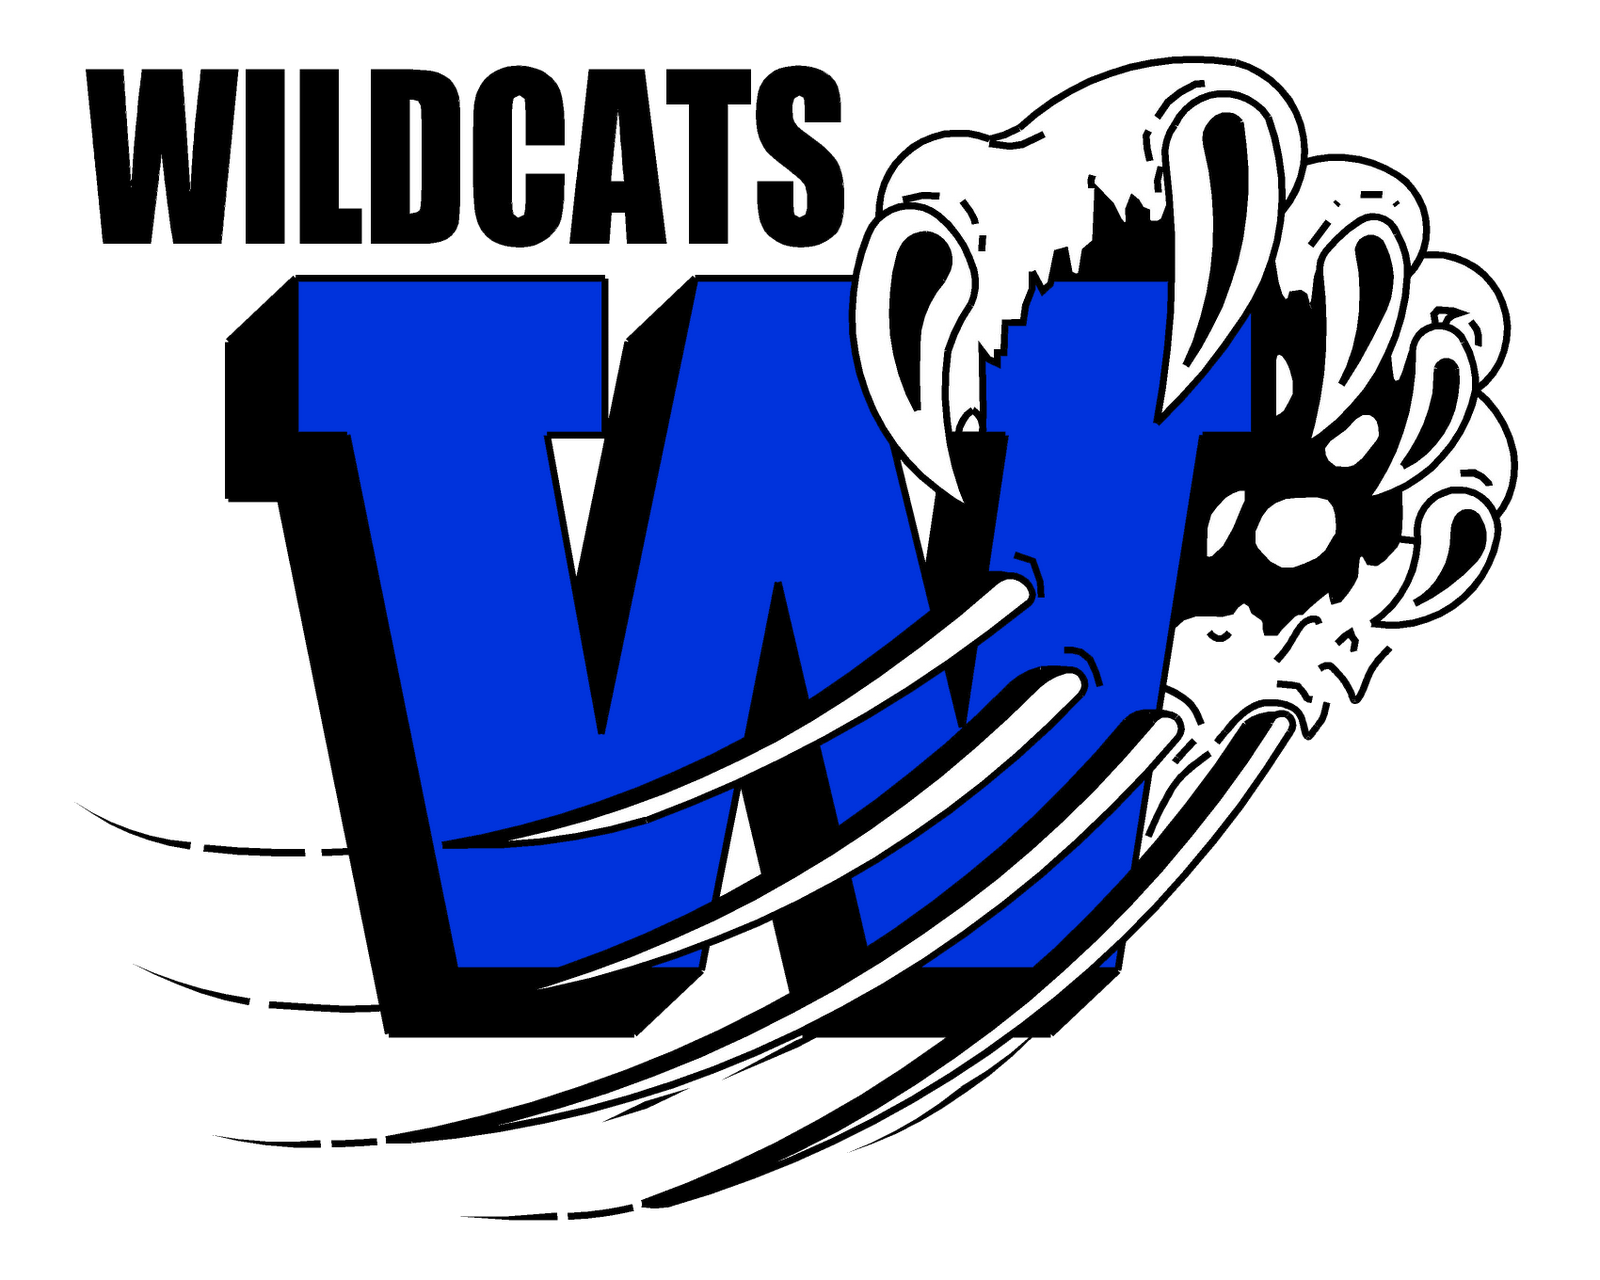 Logo free image. Wildcat clipart file